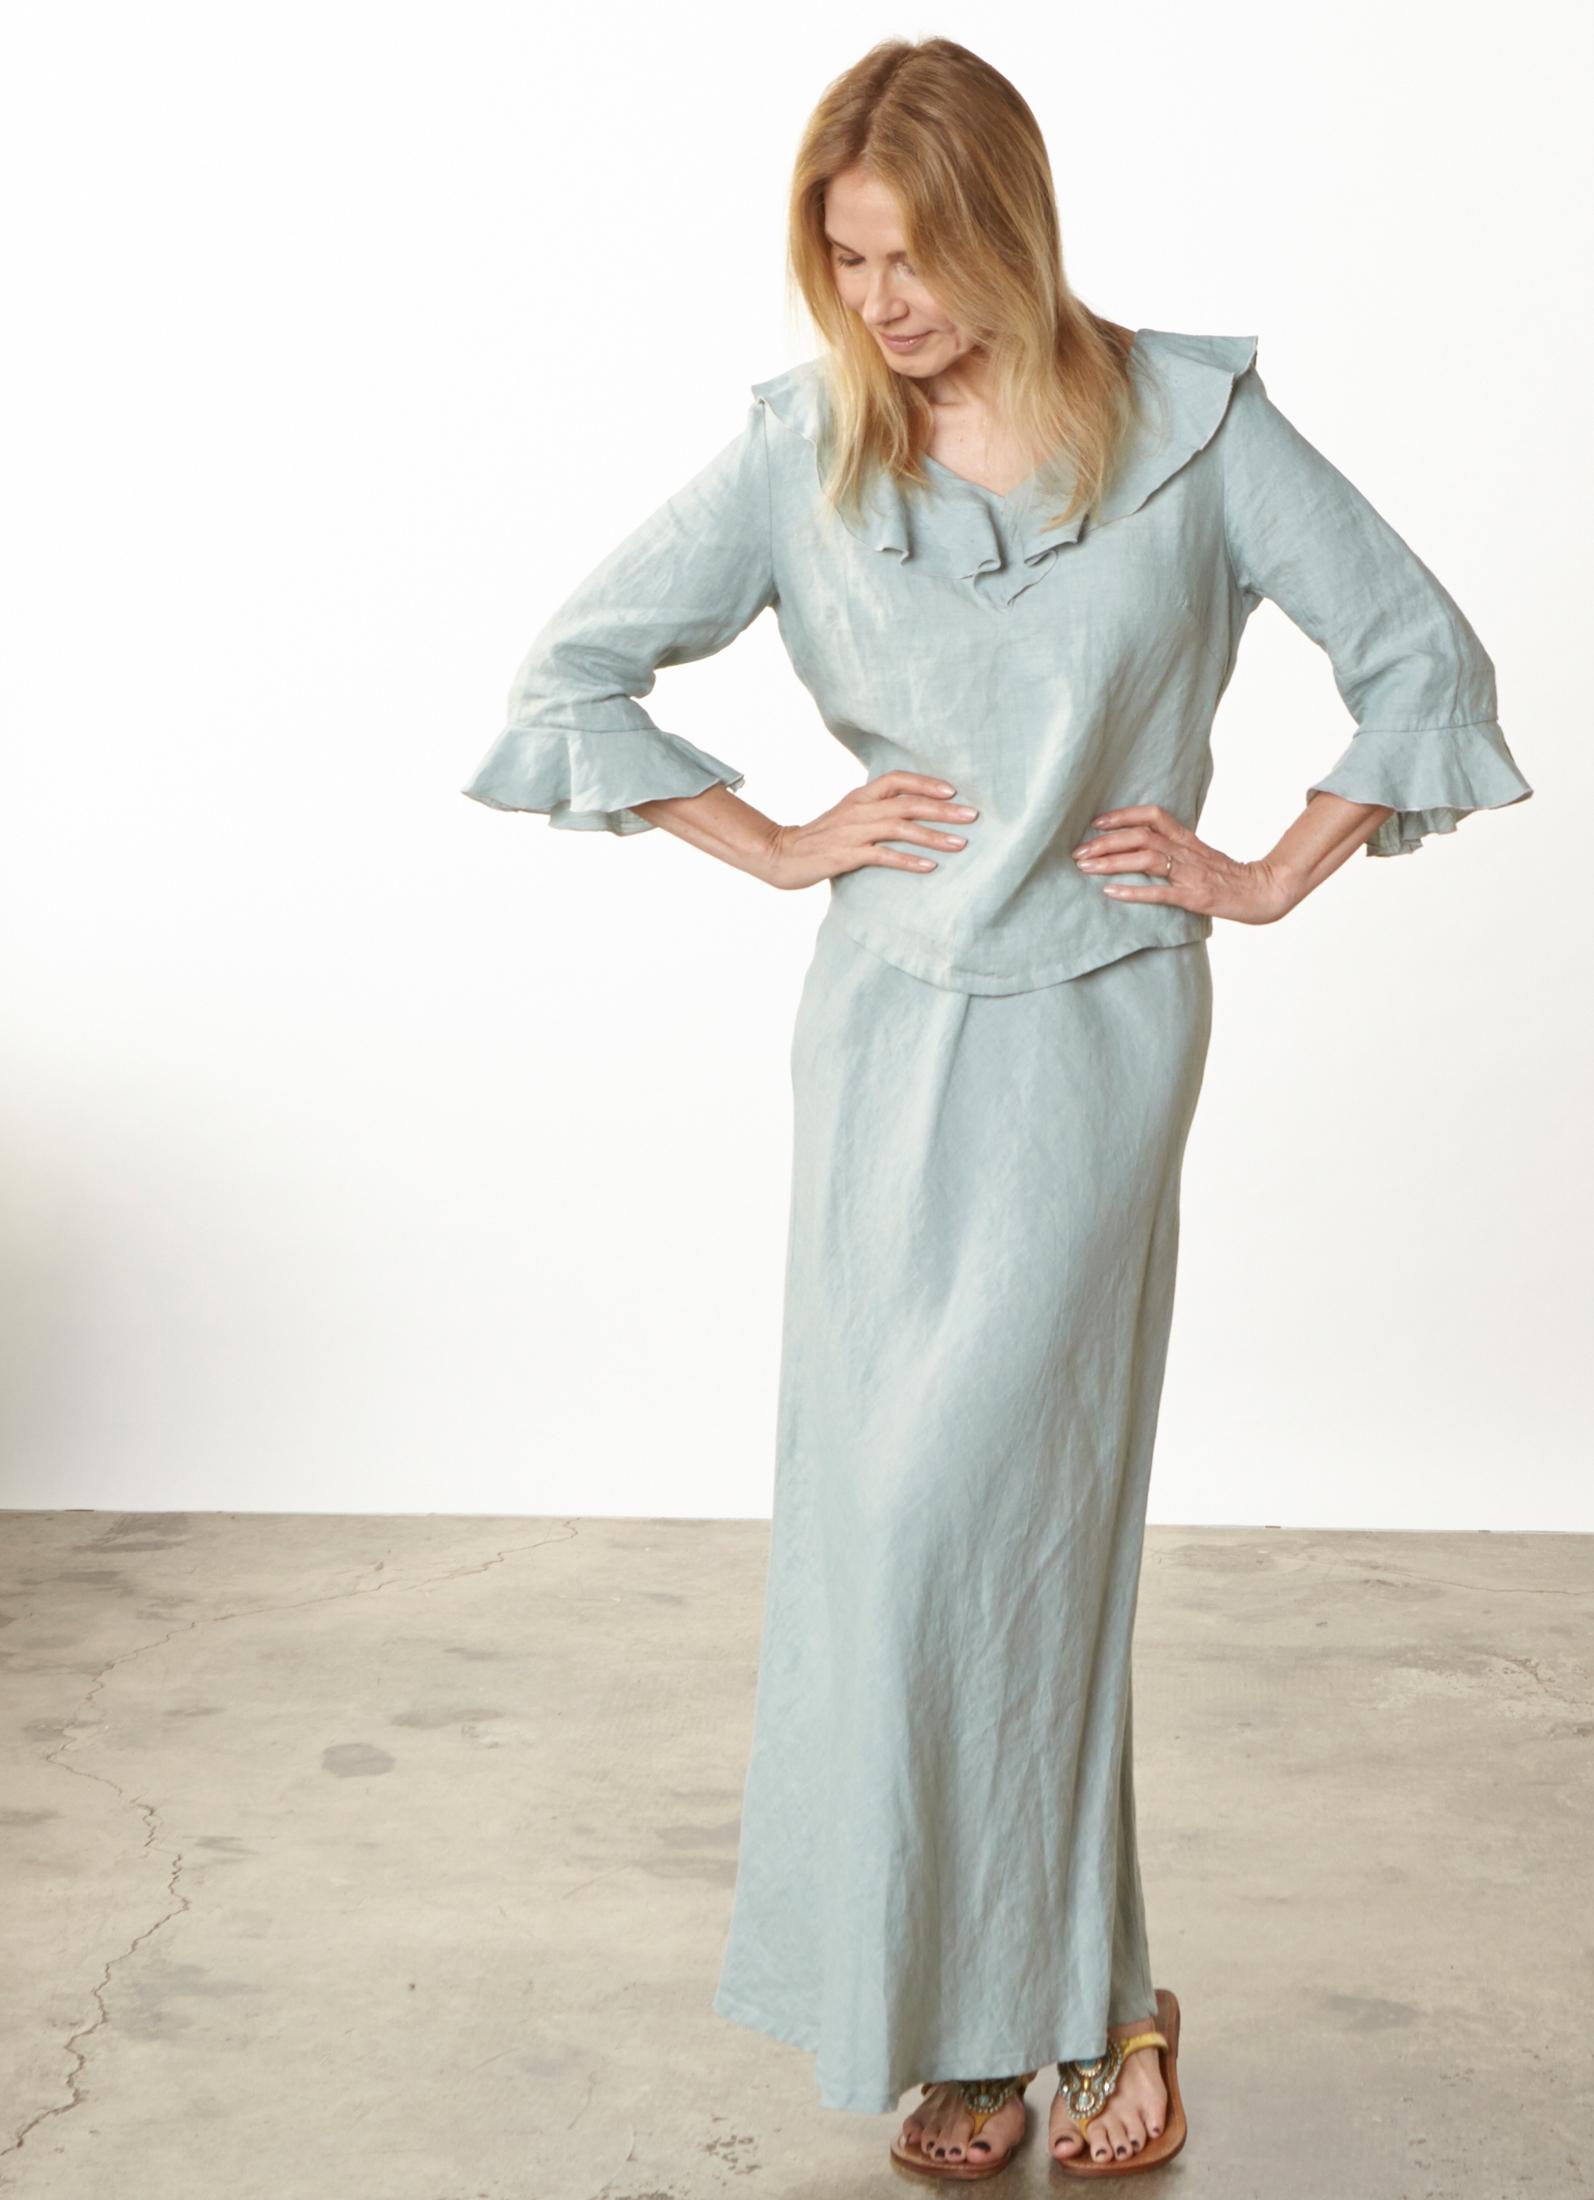 Georgia Shirt, Long Bias Skirt in Taormina Cross Dyed Linen